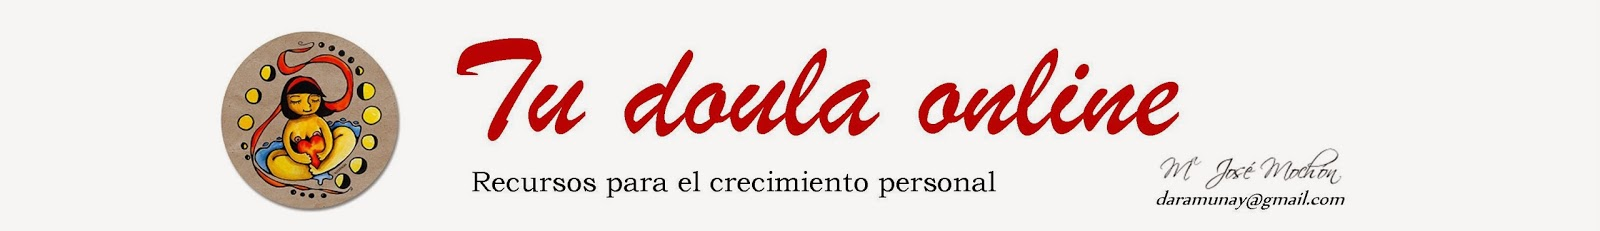 http://www.tudoulaonline.com/doula-online/